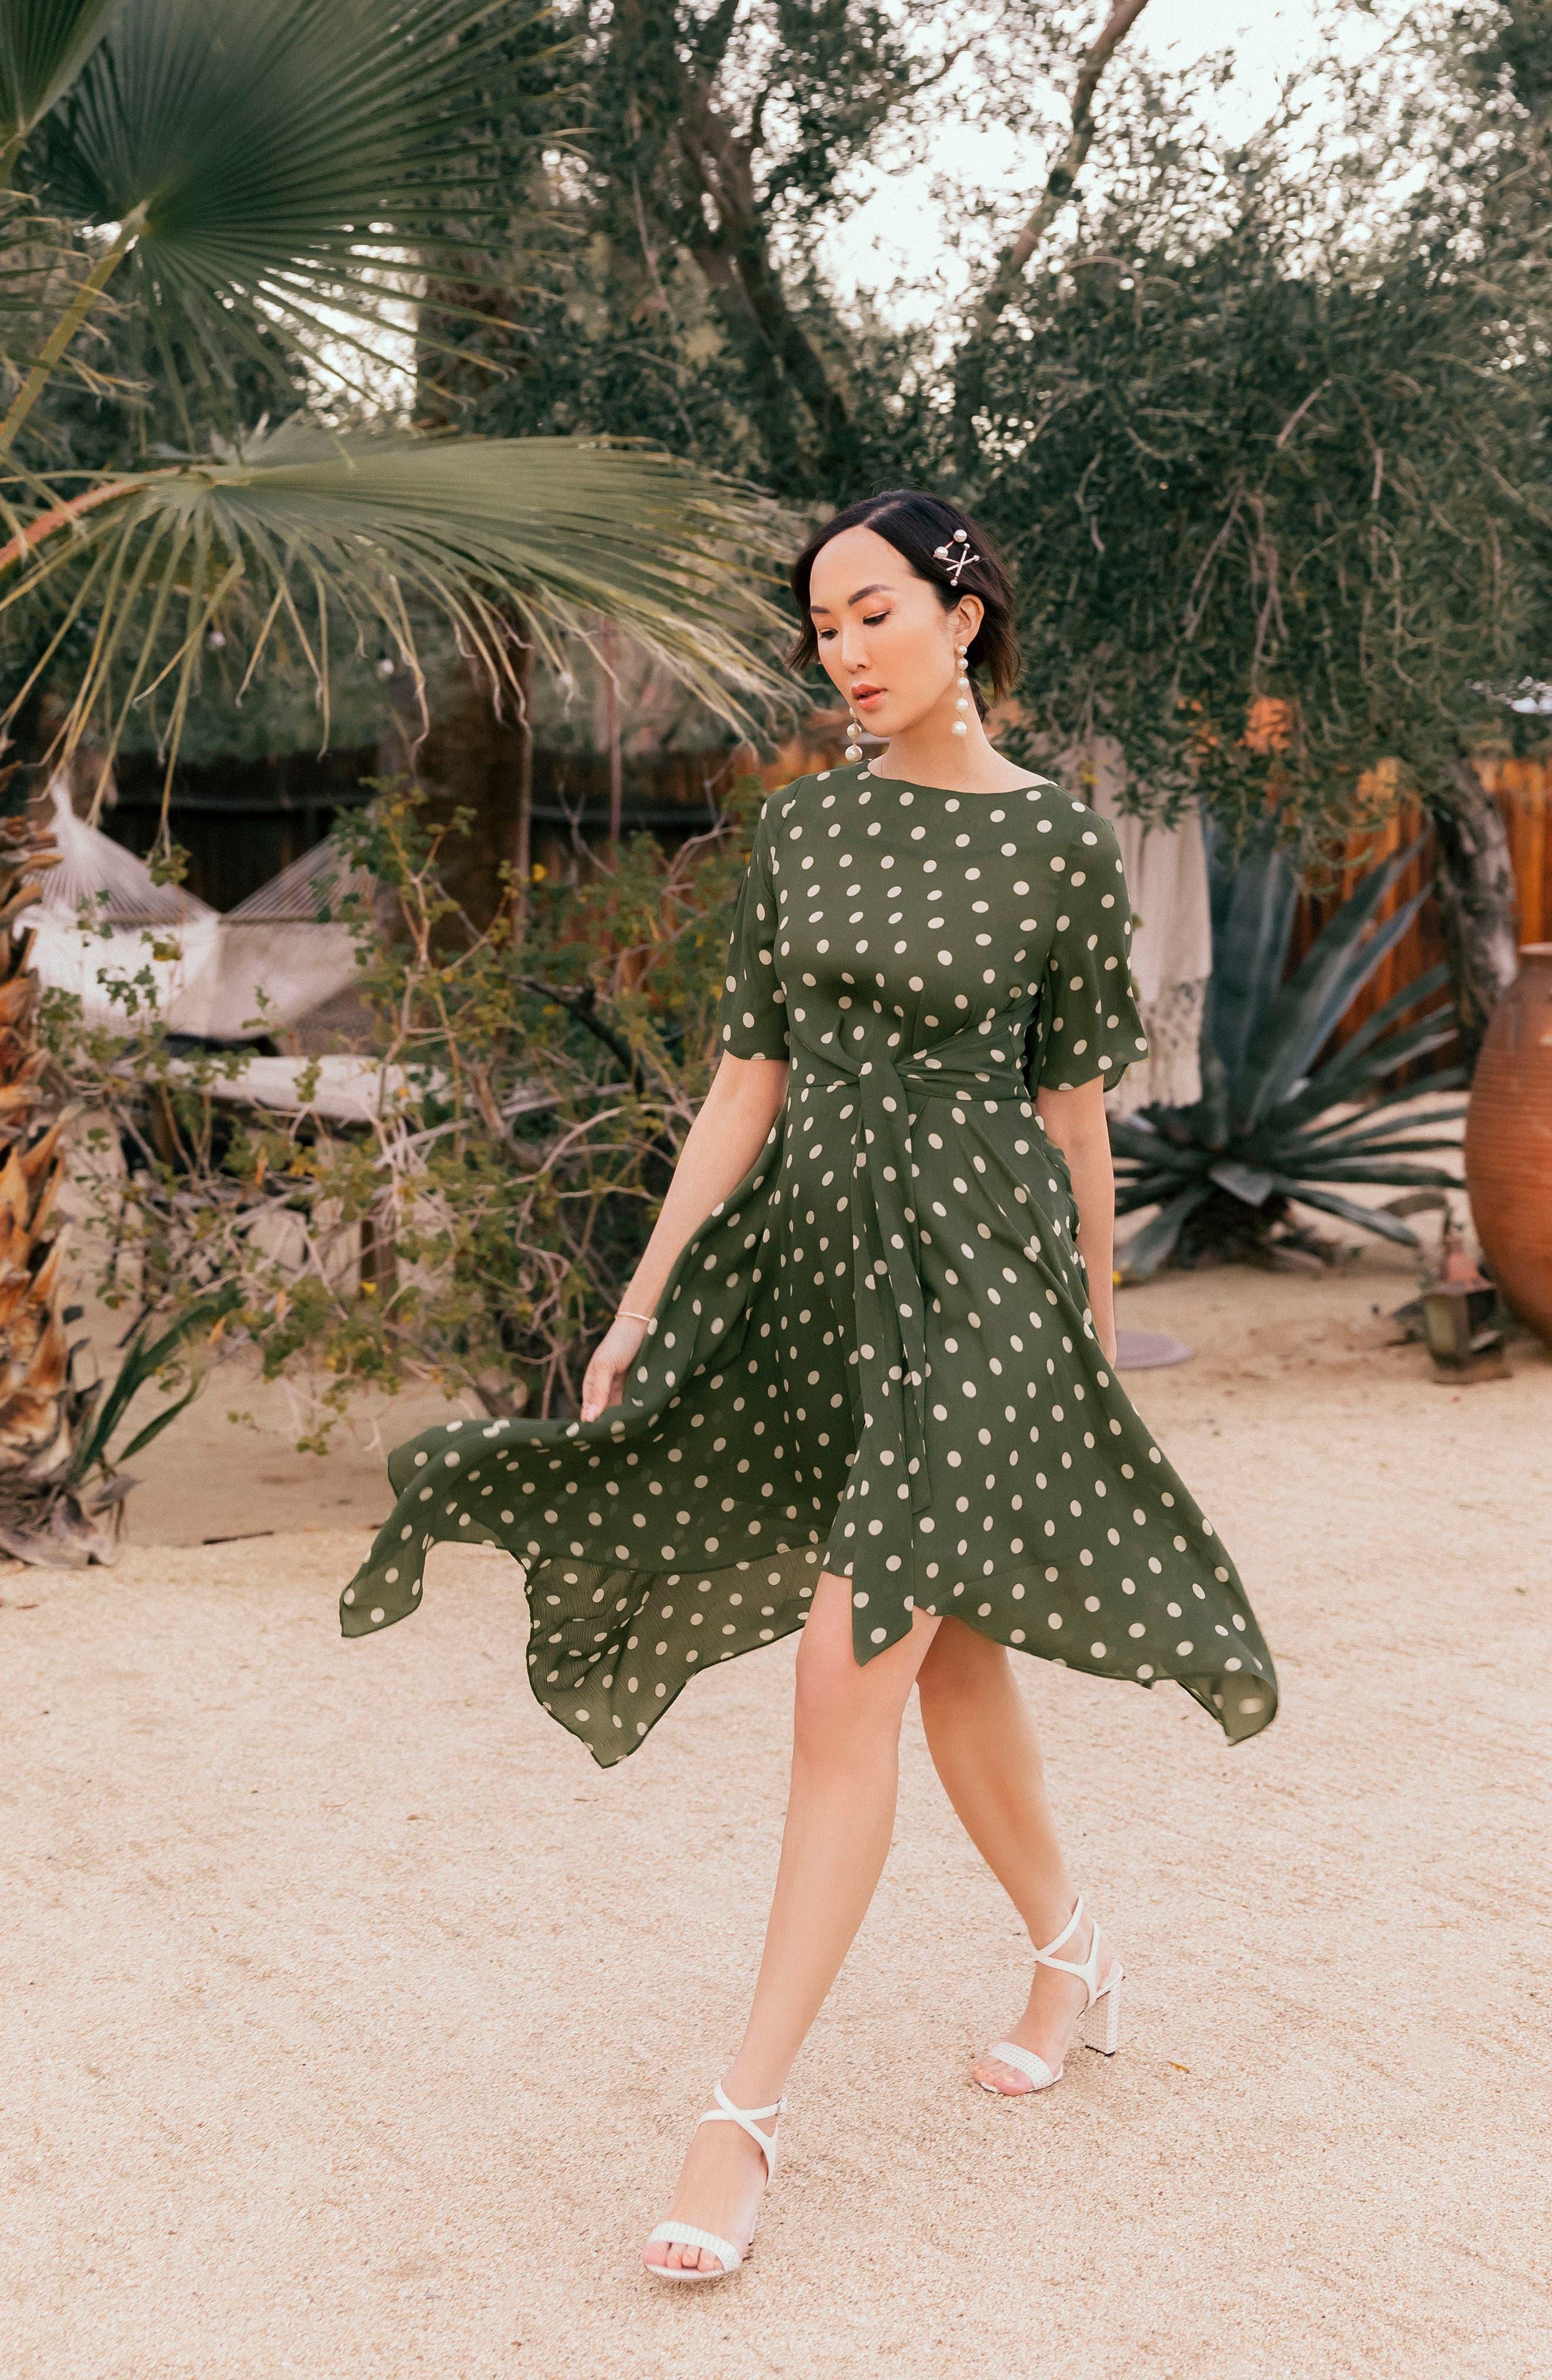 ,                             Chriselle Lim Marie Handkerchief Hem Midi Dress,                             Alternate thumbnail 8, color,                             900